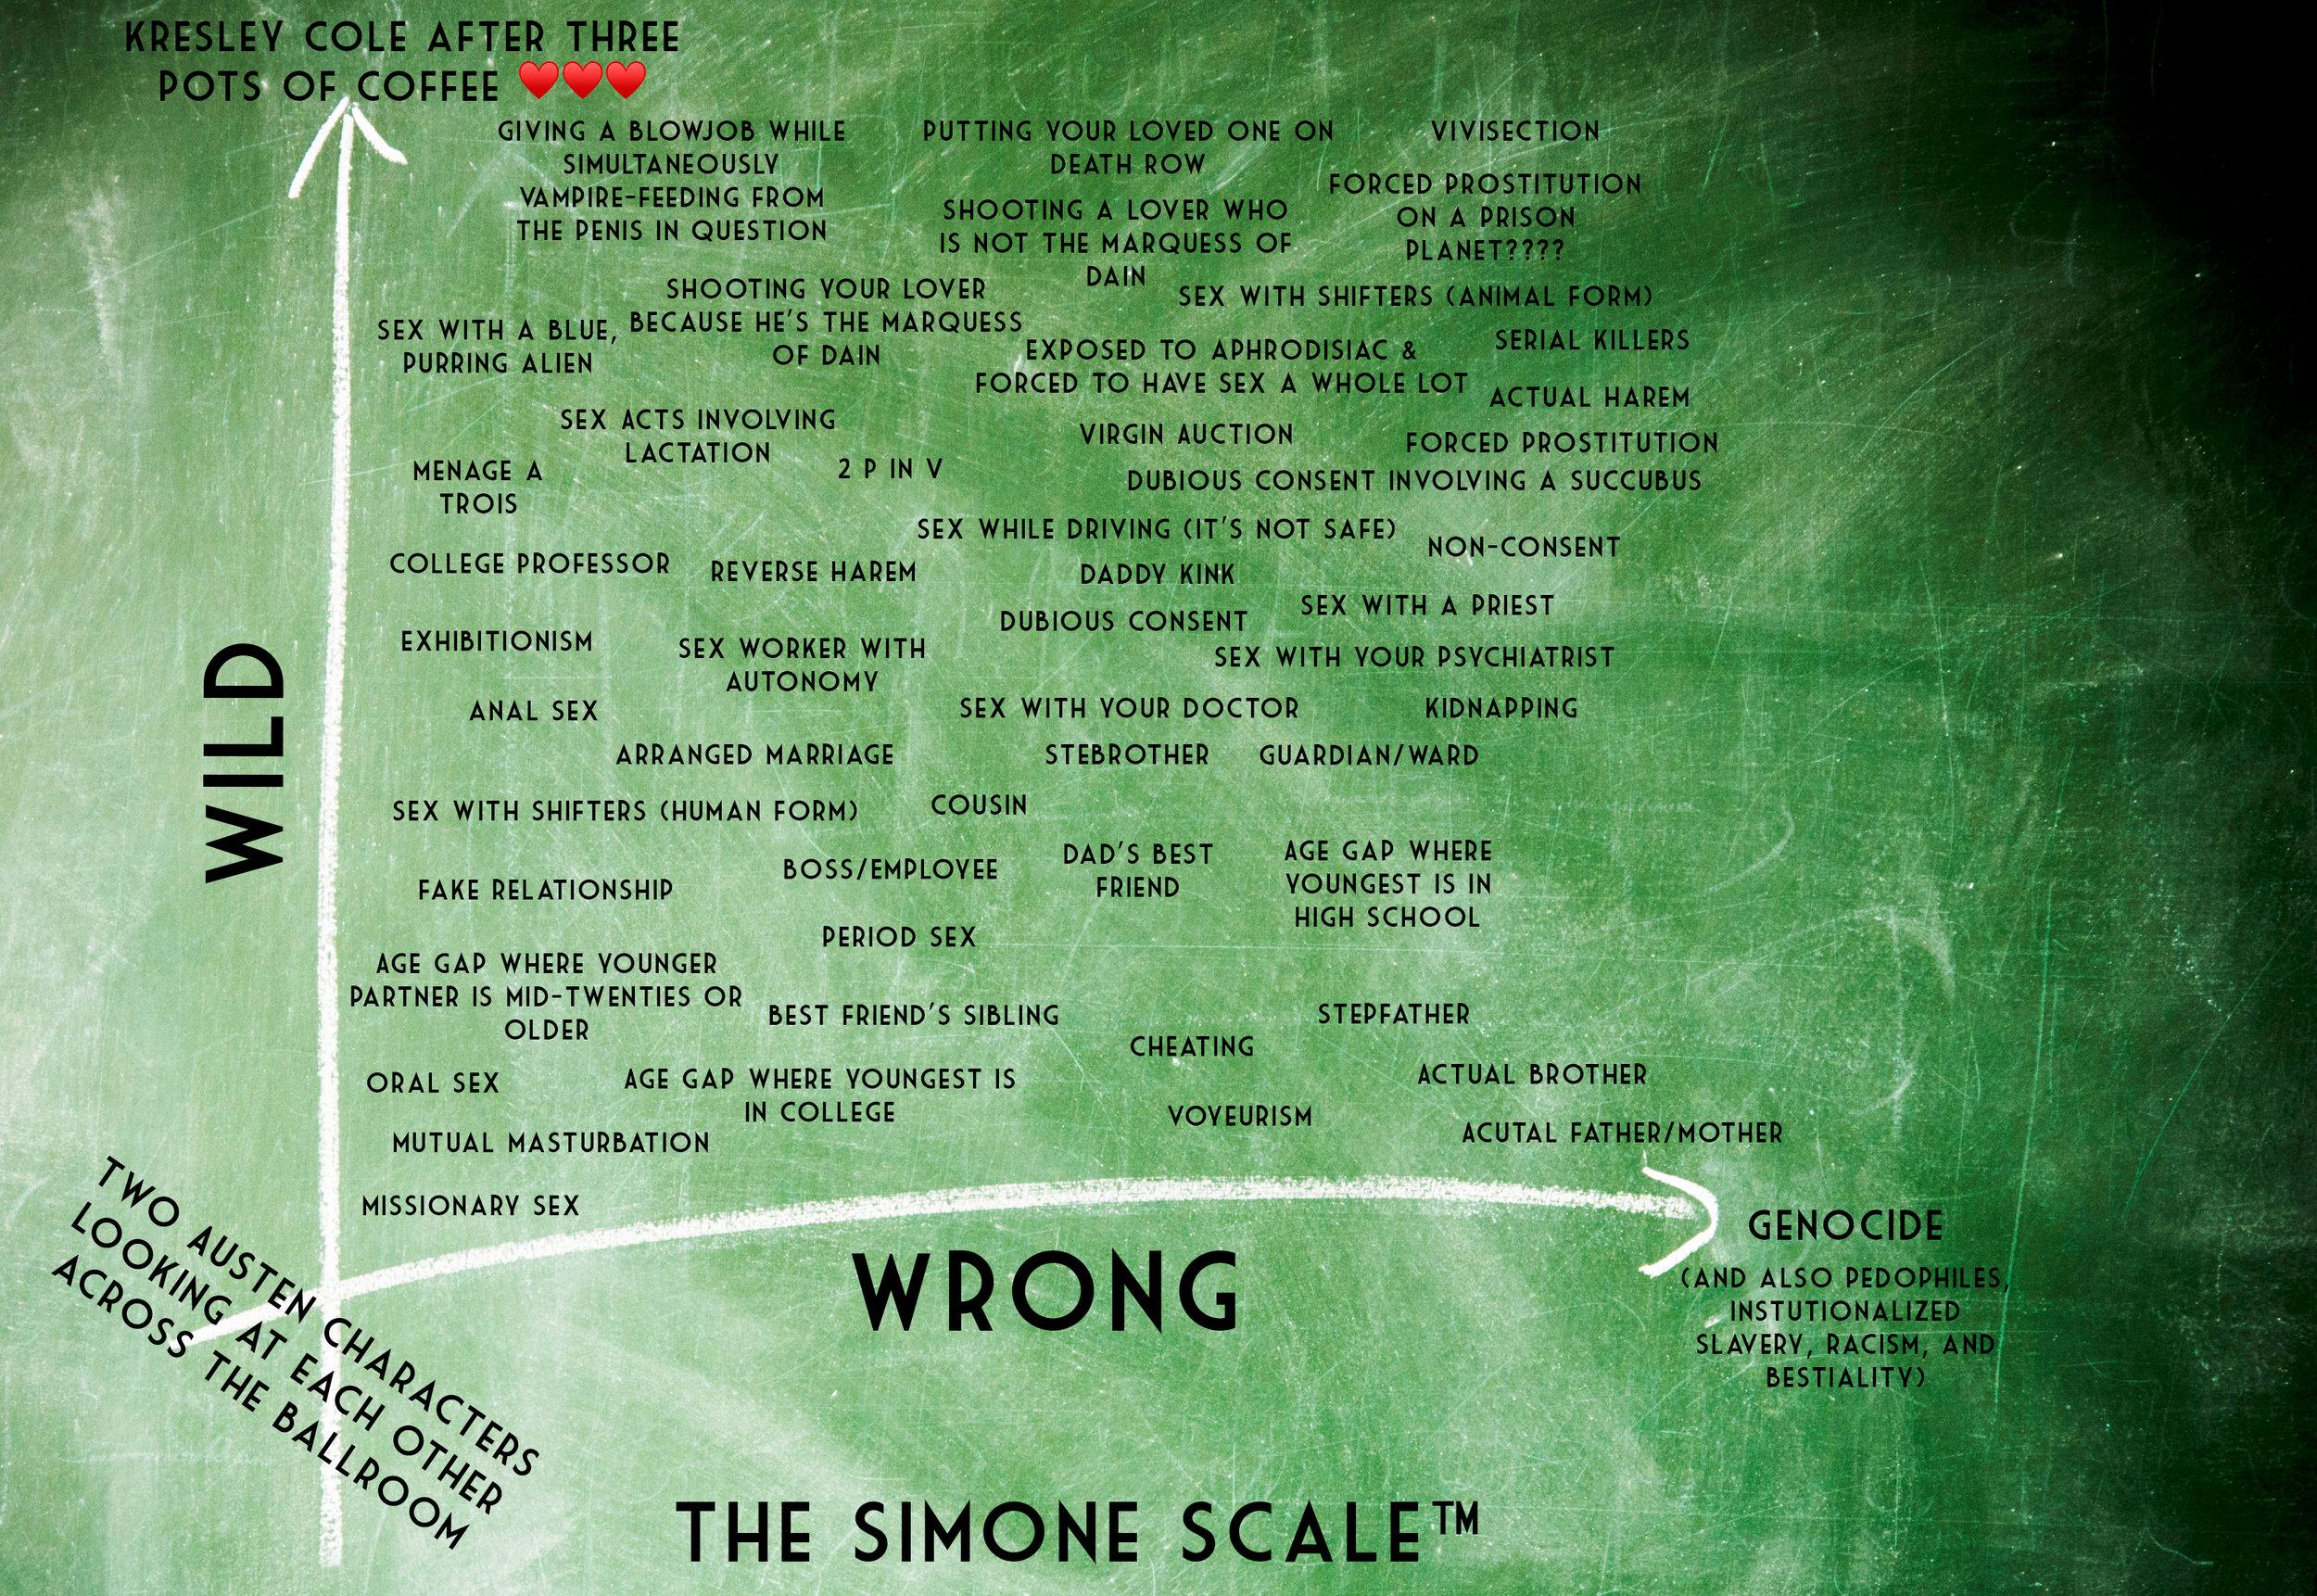 taboo chart.jpg